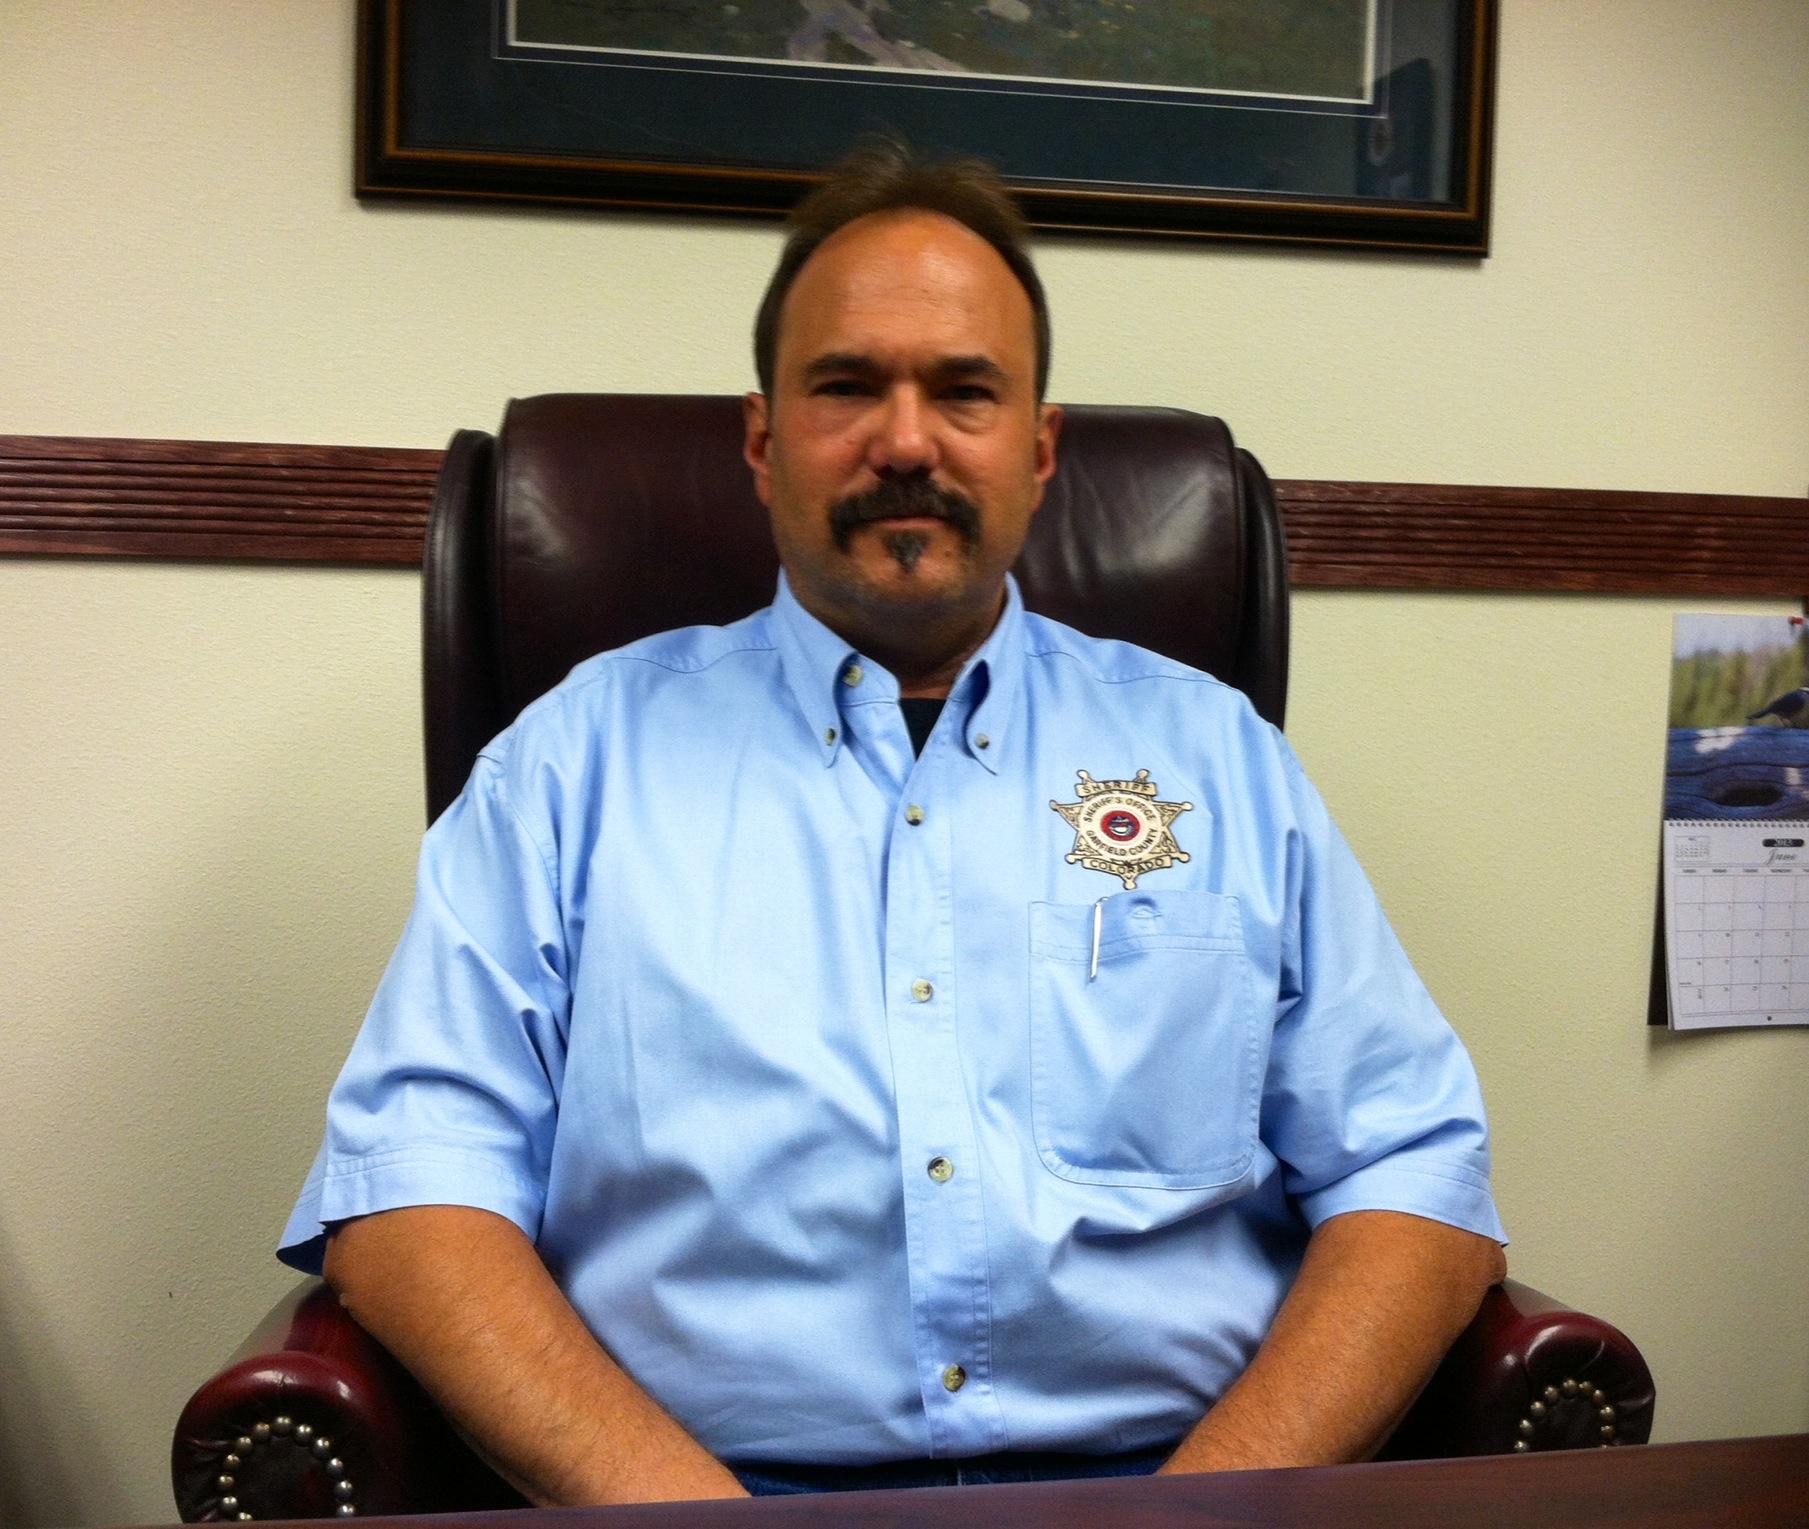 Garfield County Sheriff: Colorado Gun-Control Laws Too